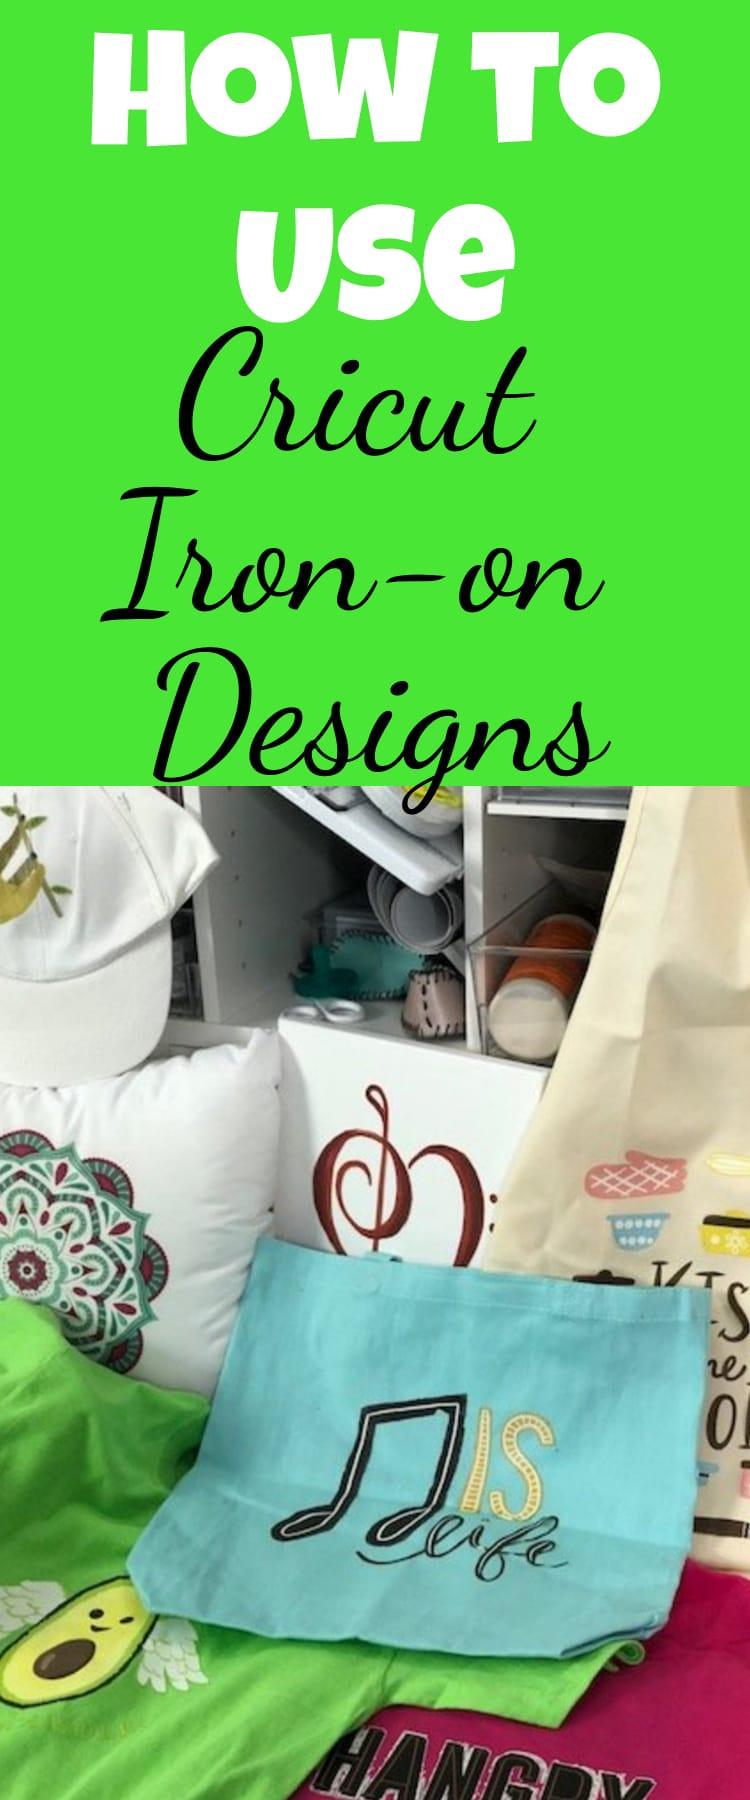 Cricut iron-on / cricut iron-on designs / cricut rpojects / diy projects / heat transfer projects via @clarkscondensed